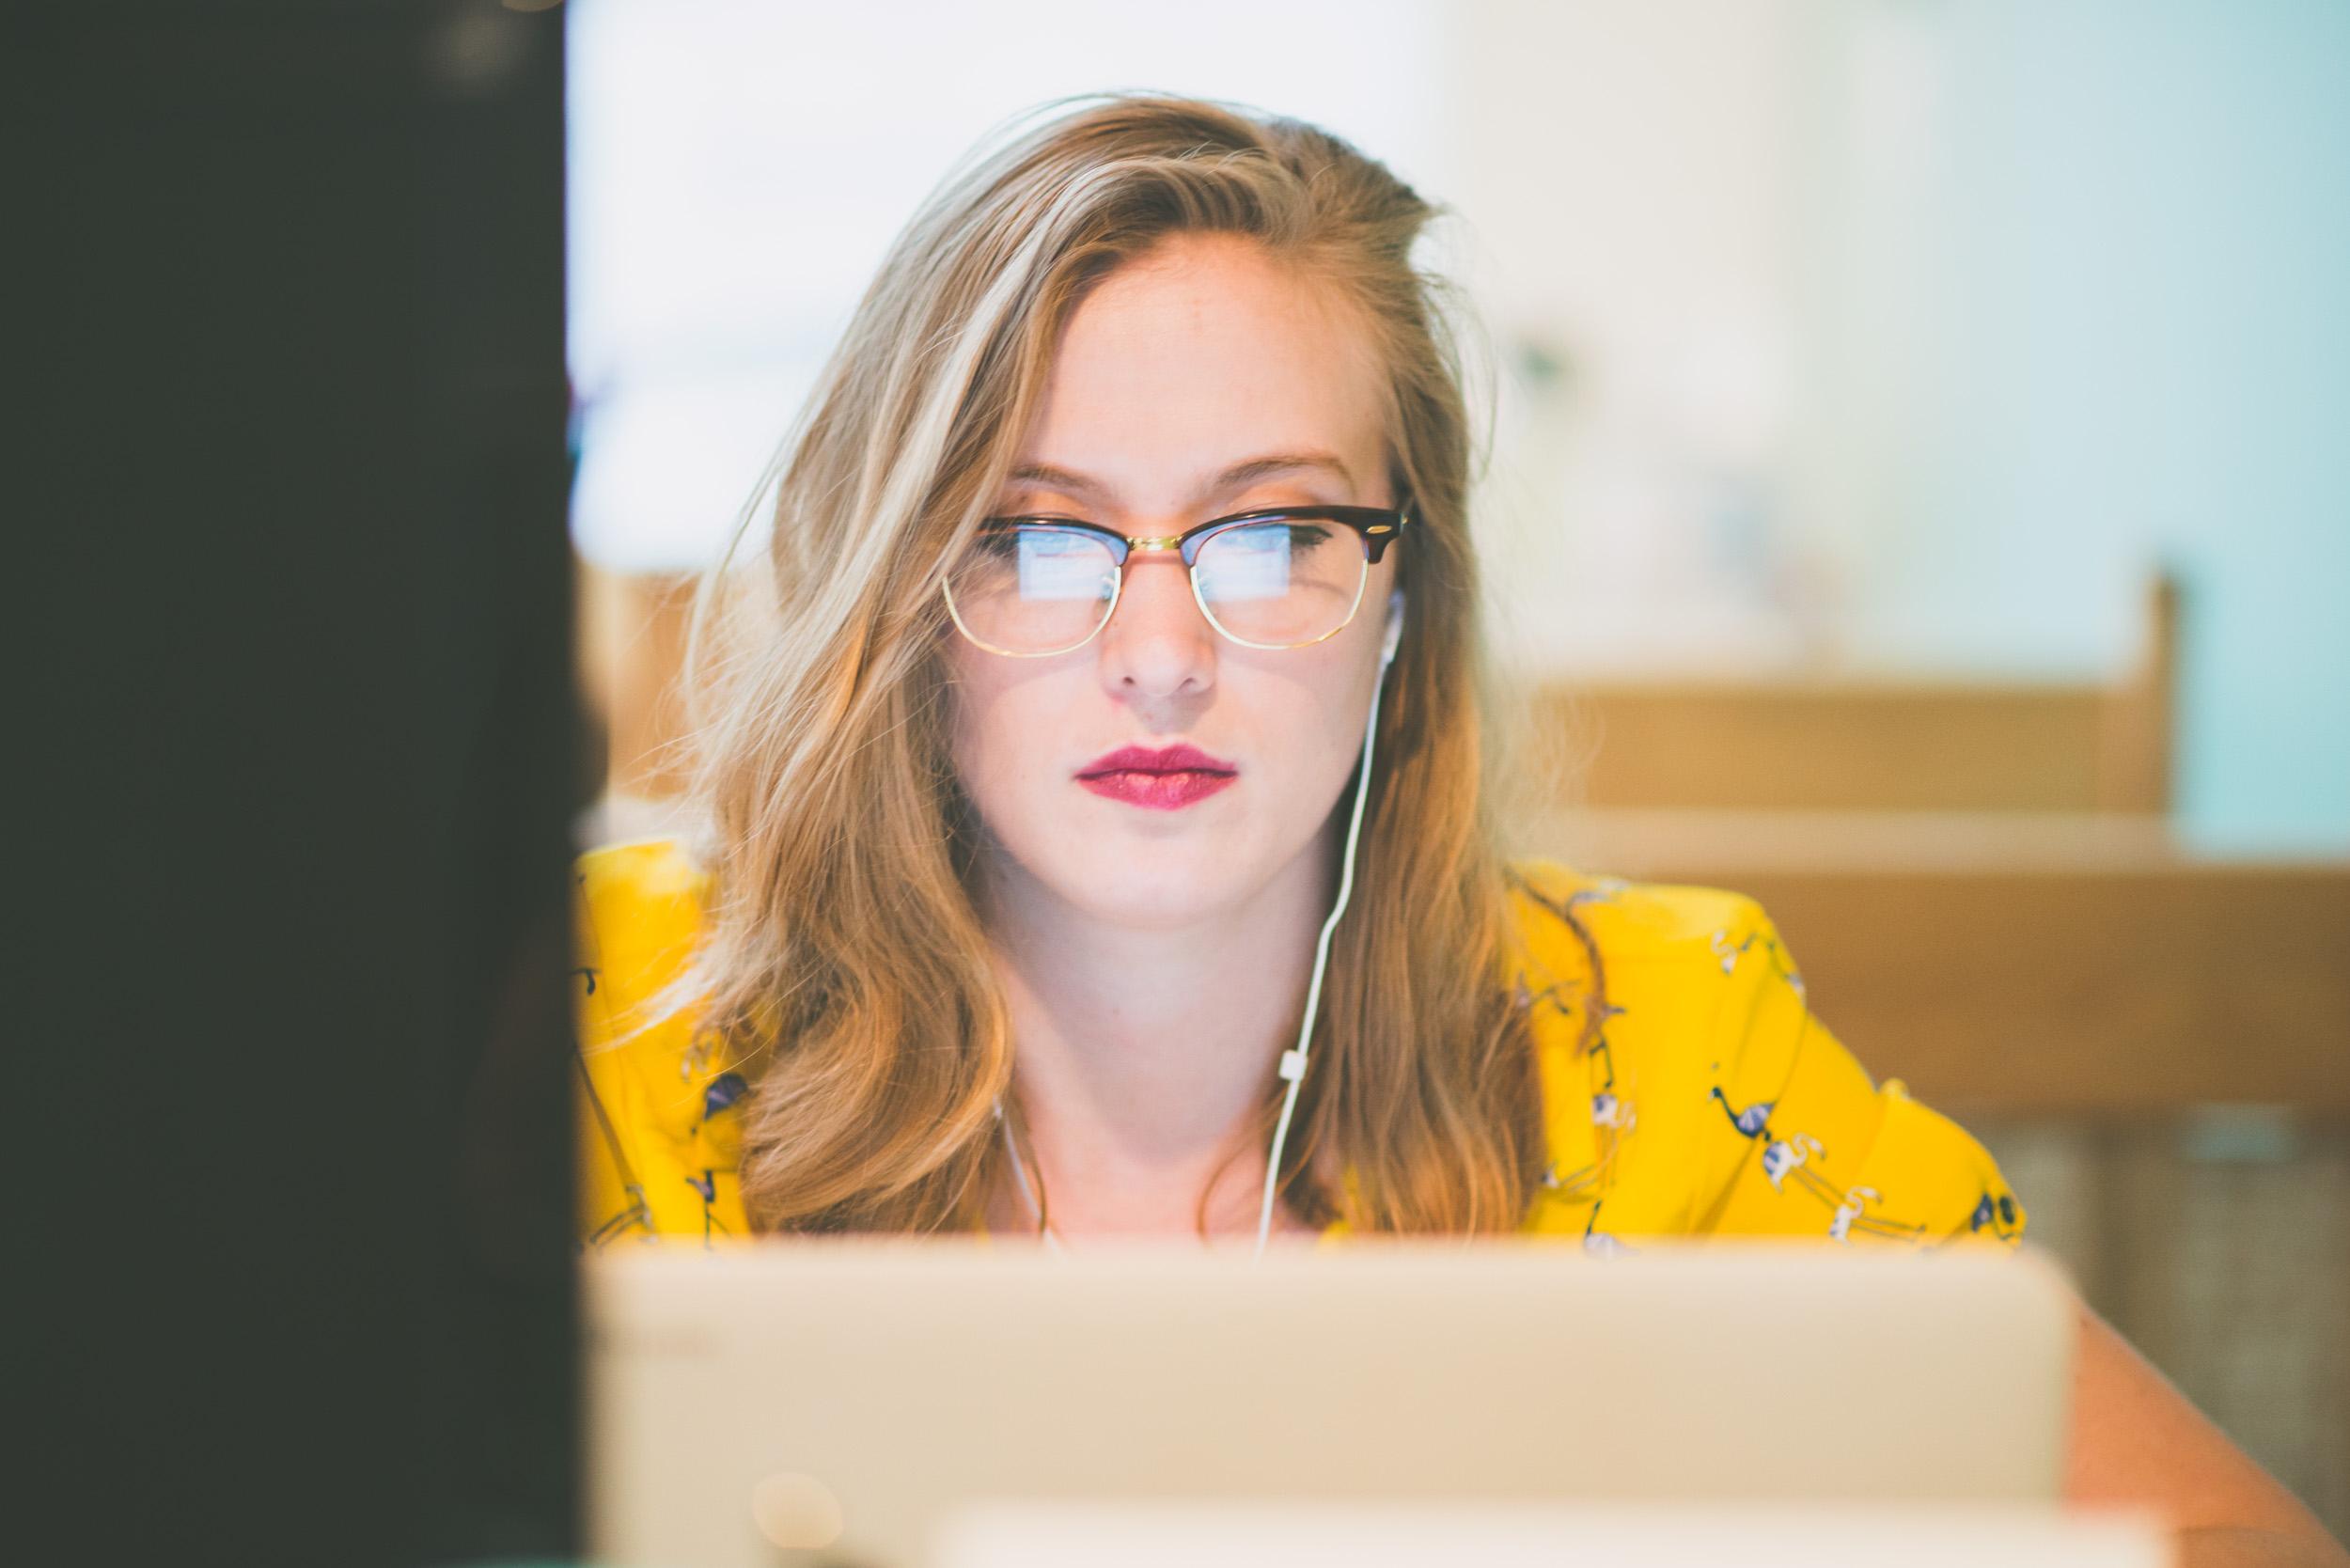 Woman hard at work- worklife portraits -  photo credit Nicola Bailey.jpg